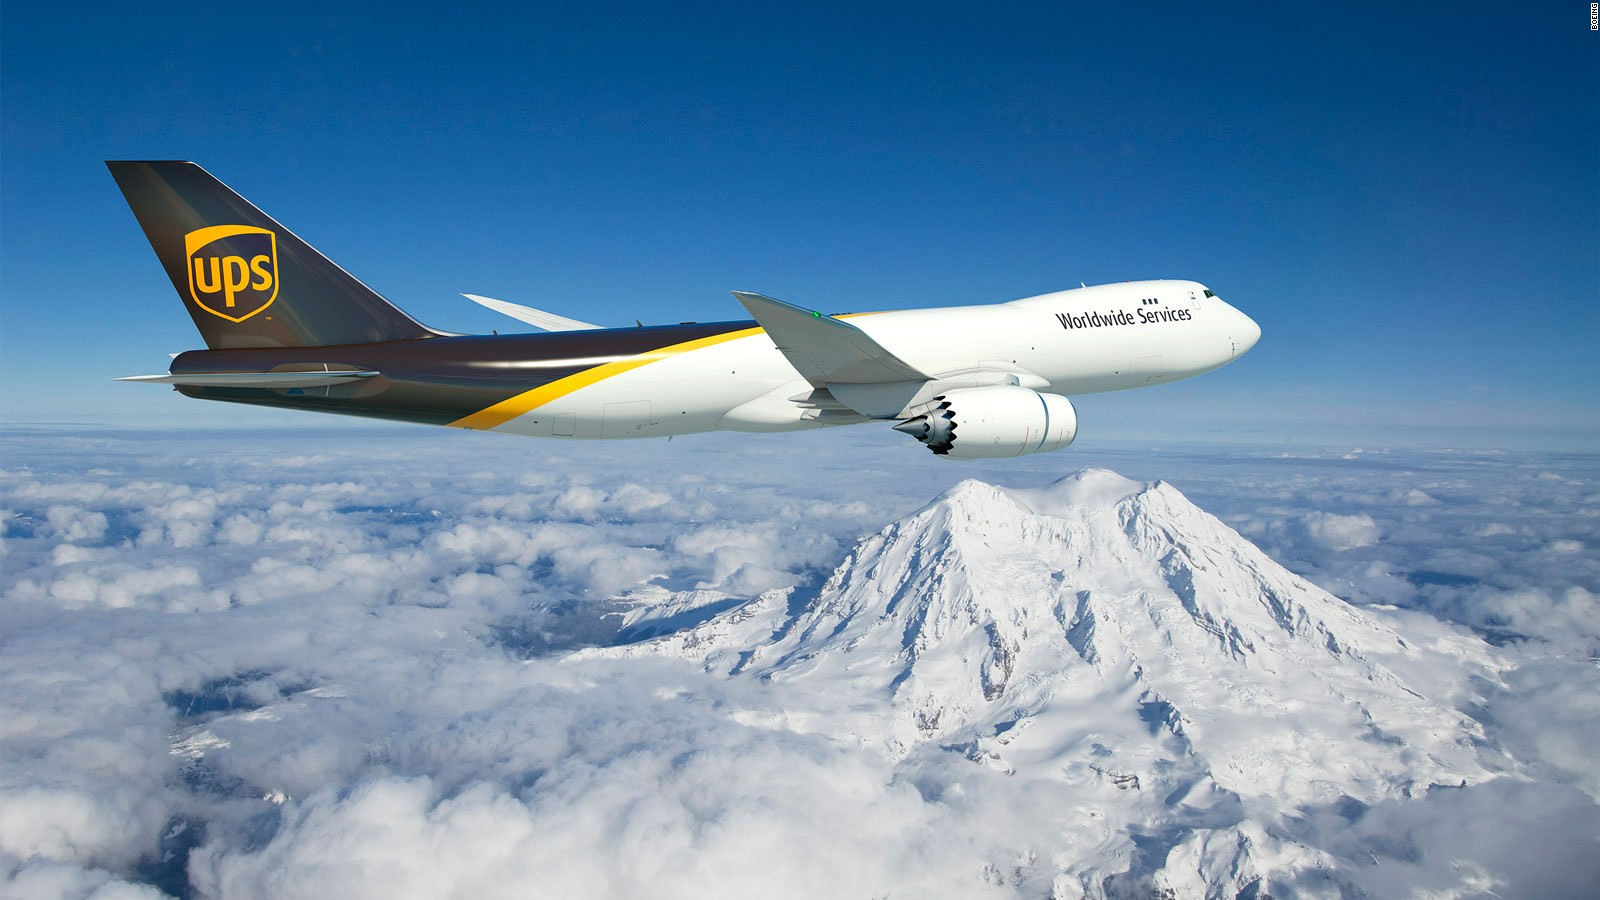 Boeing 747 jumbo jet changed travel these 5 ways | CNN Travel